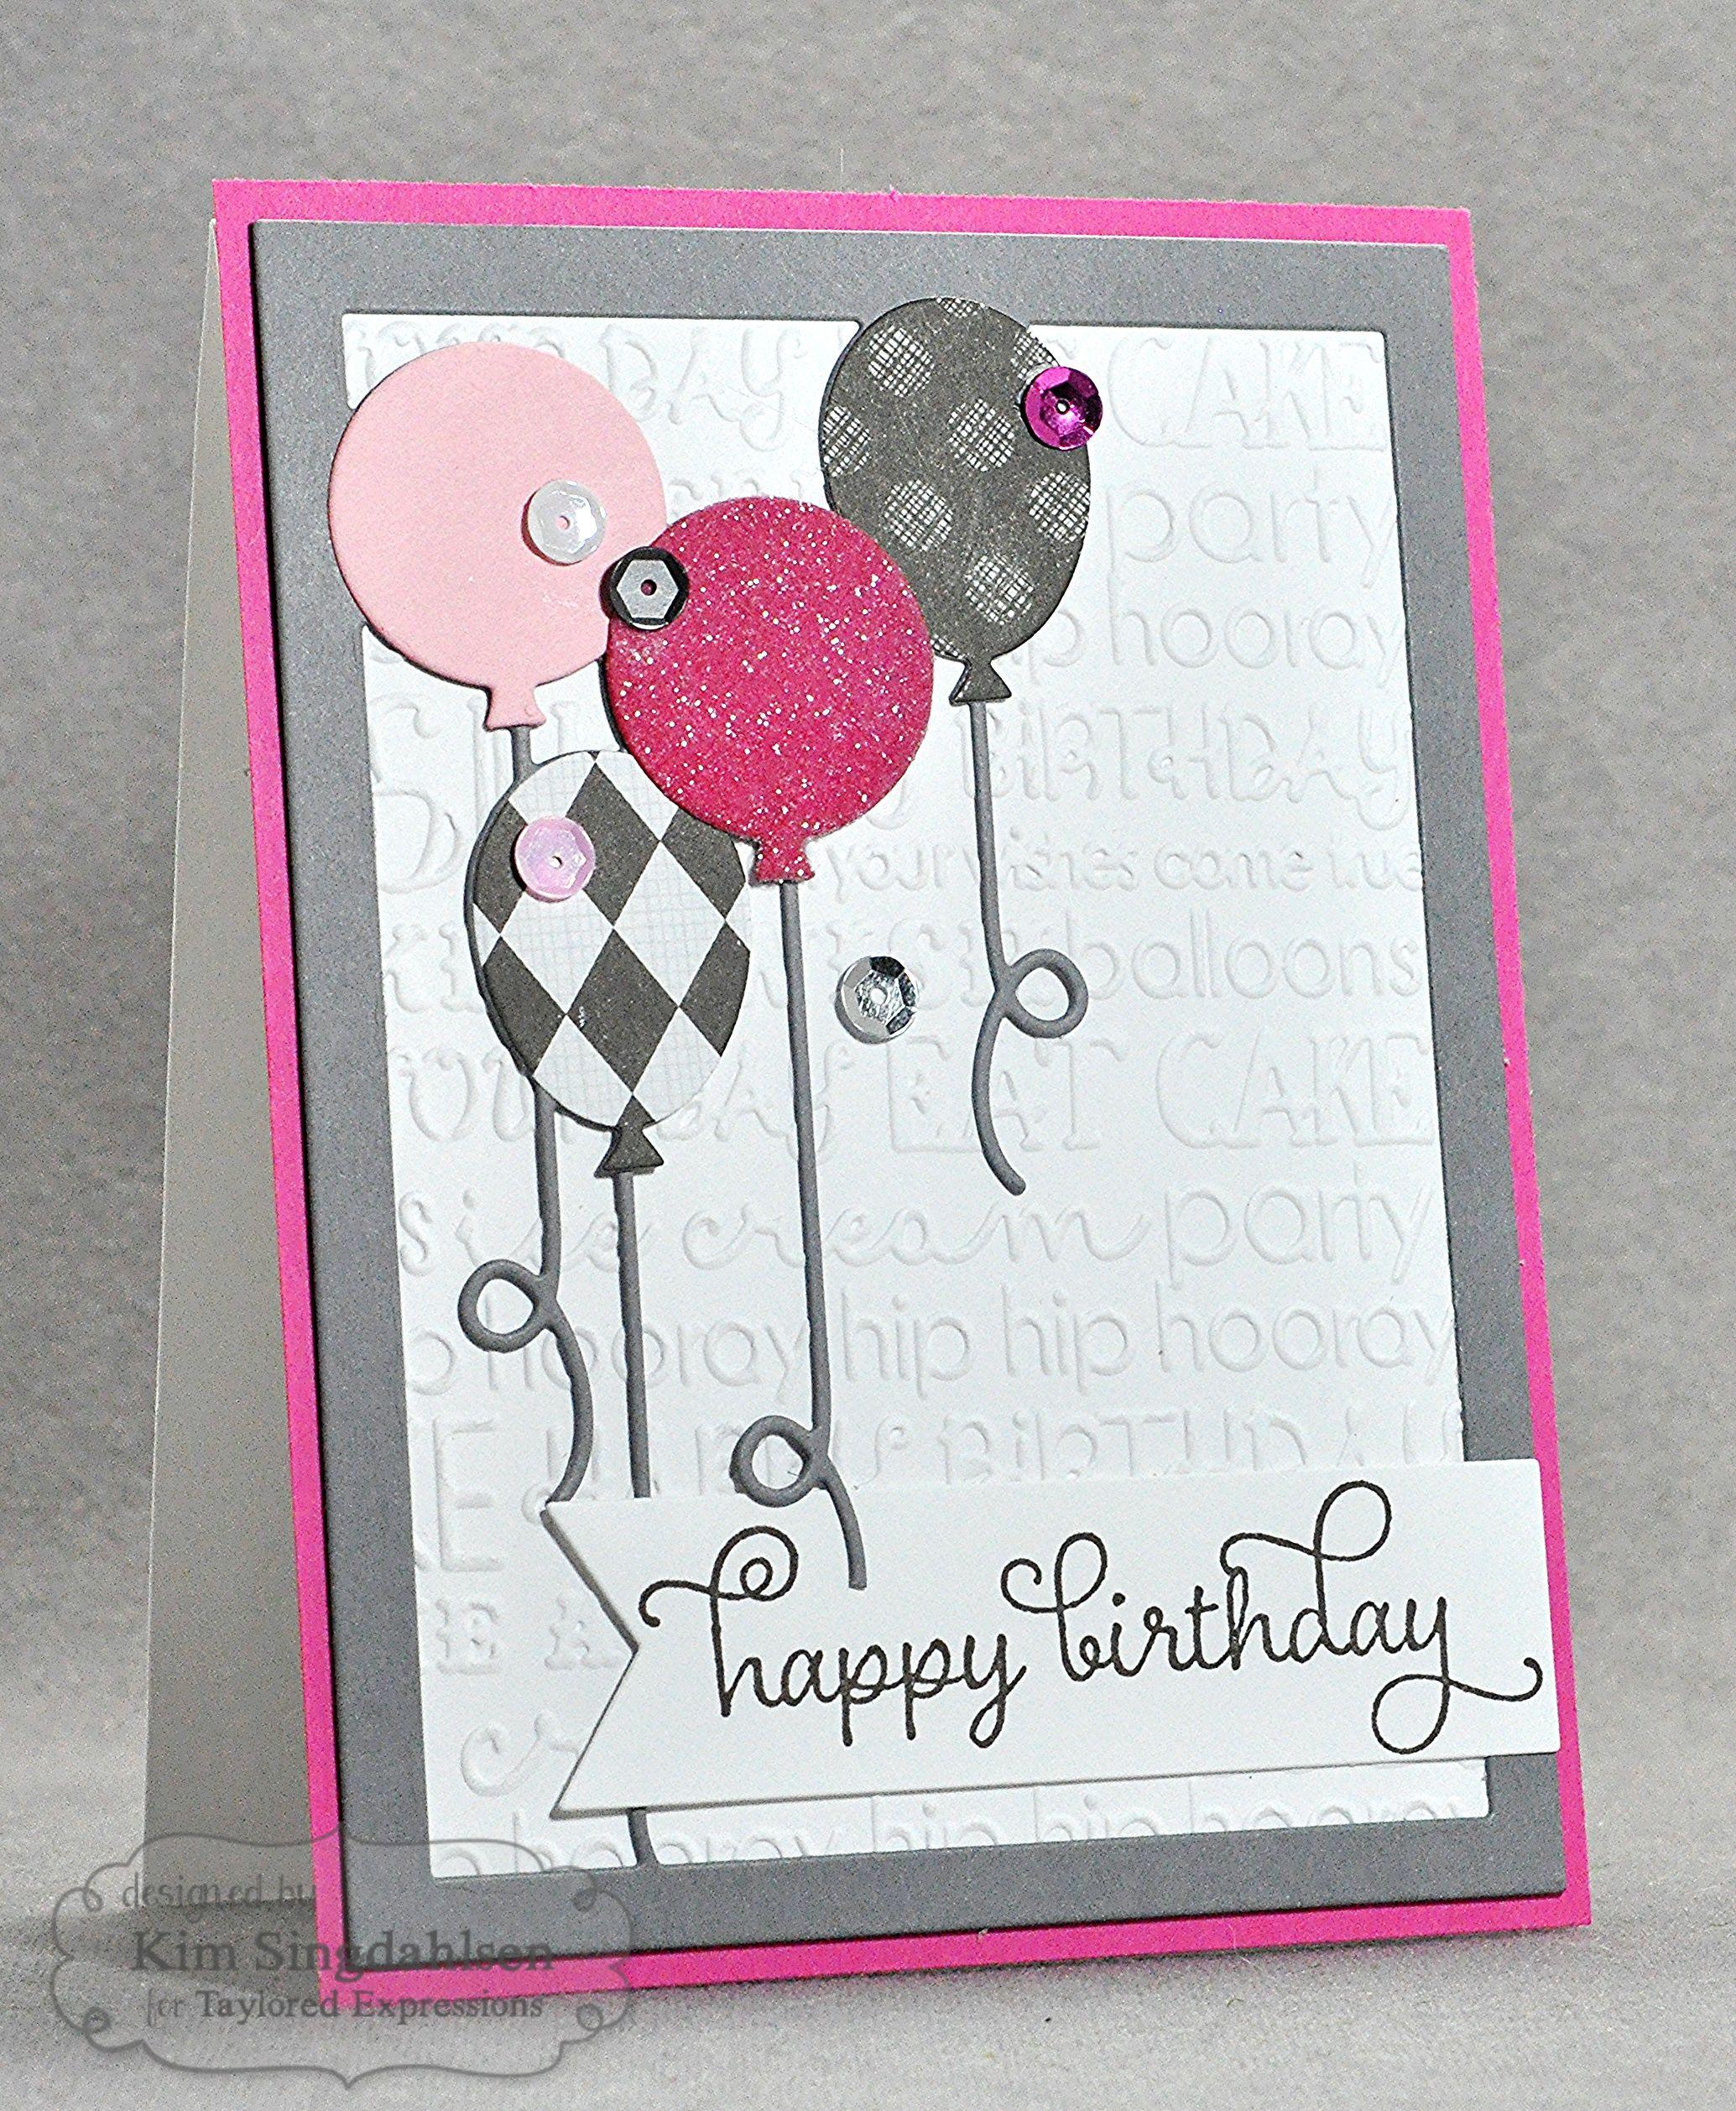 Glittered Birthday Balloons By Kim Singdahlsen